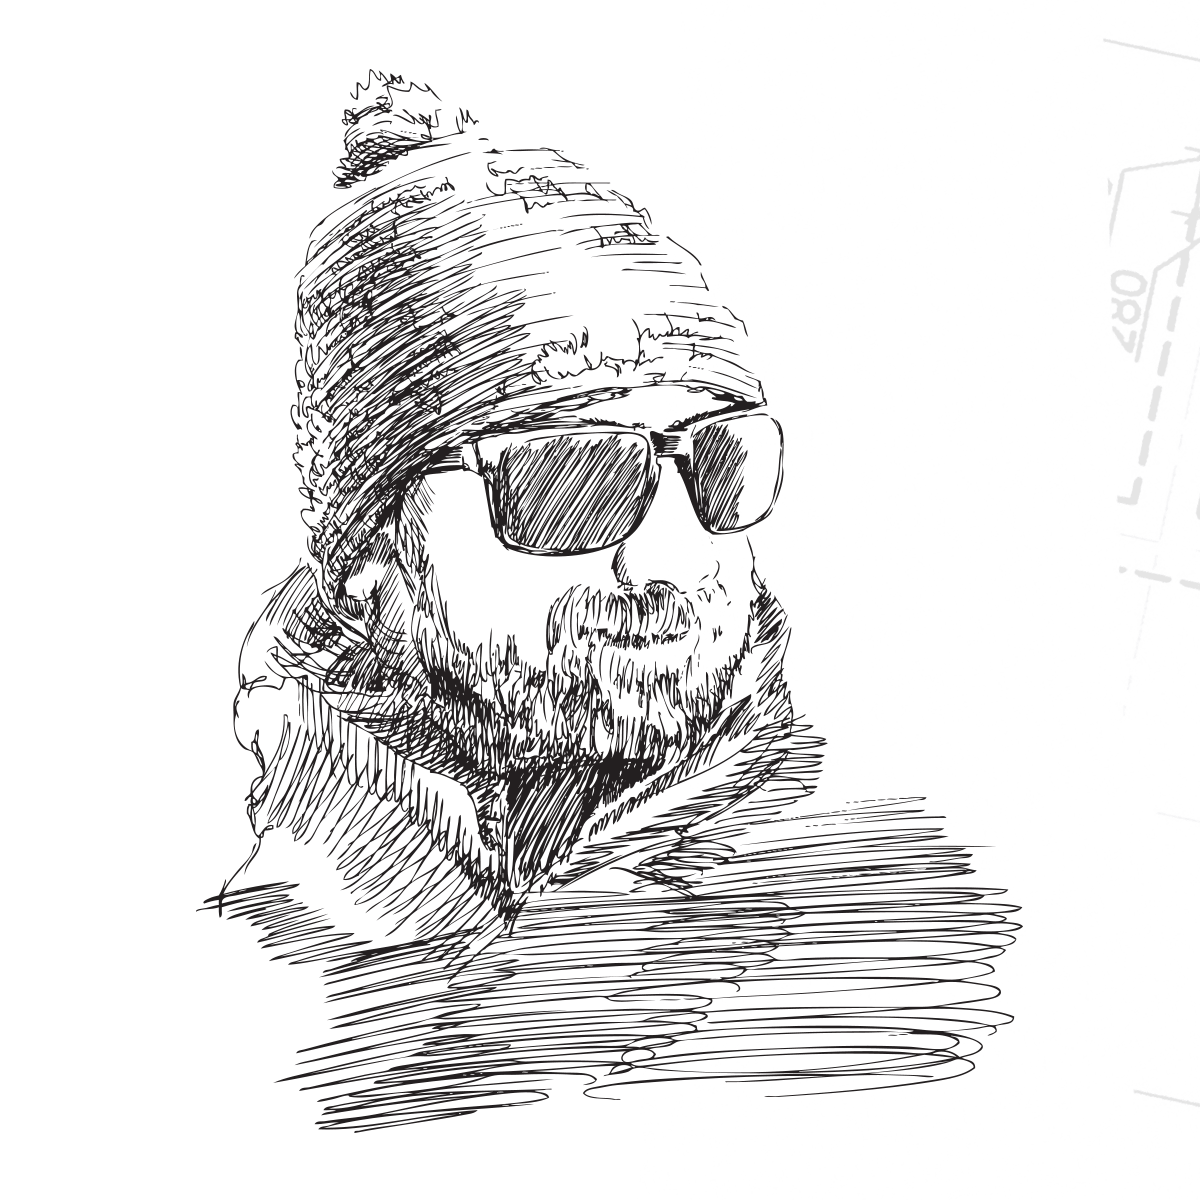 https://www.archiverde.it/wp-content/uploads/2017/05/minimalist-image-team-member-02-large.png